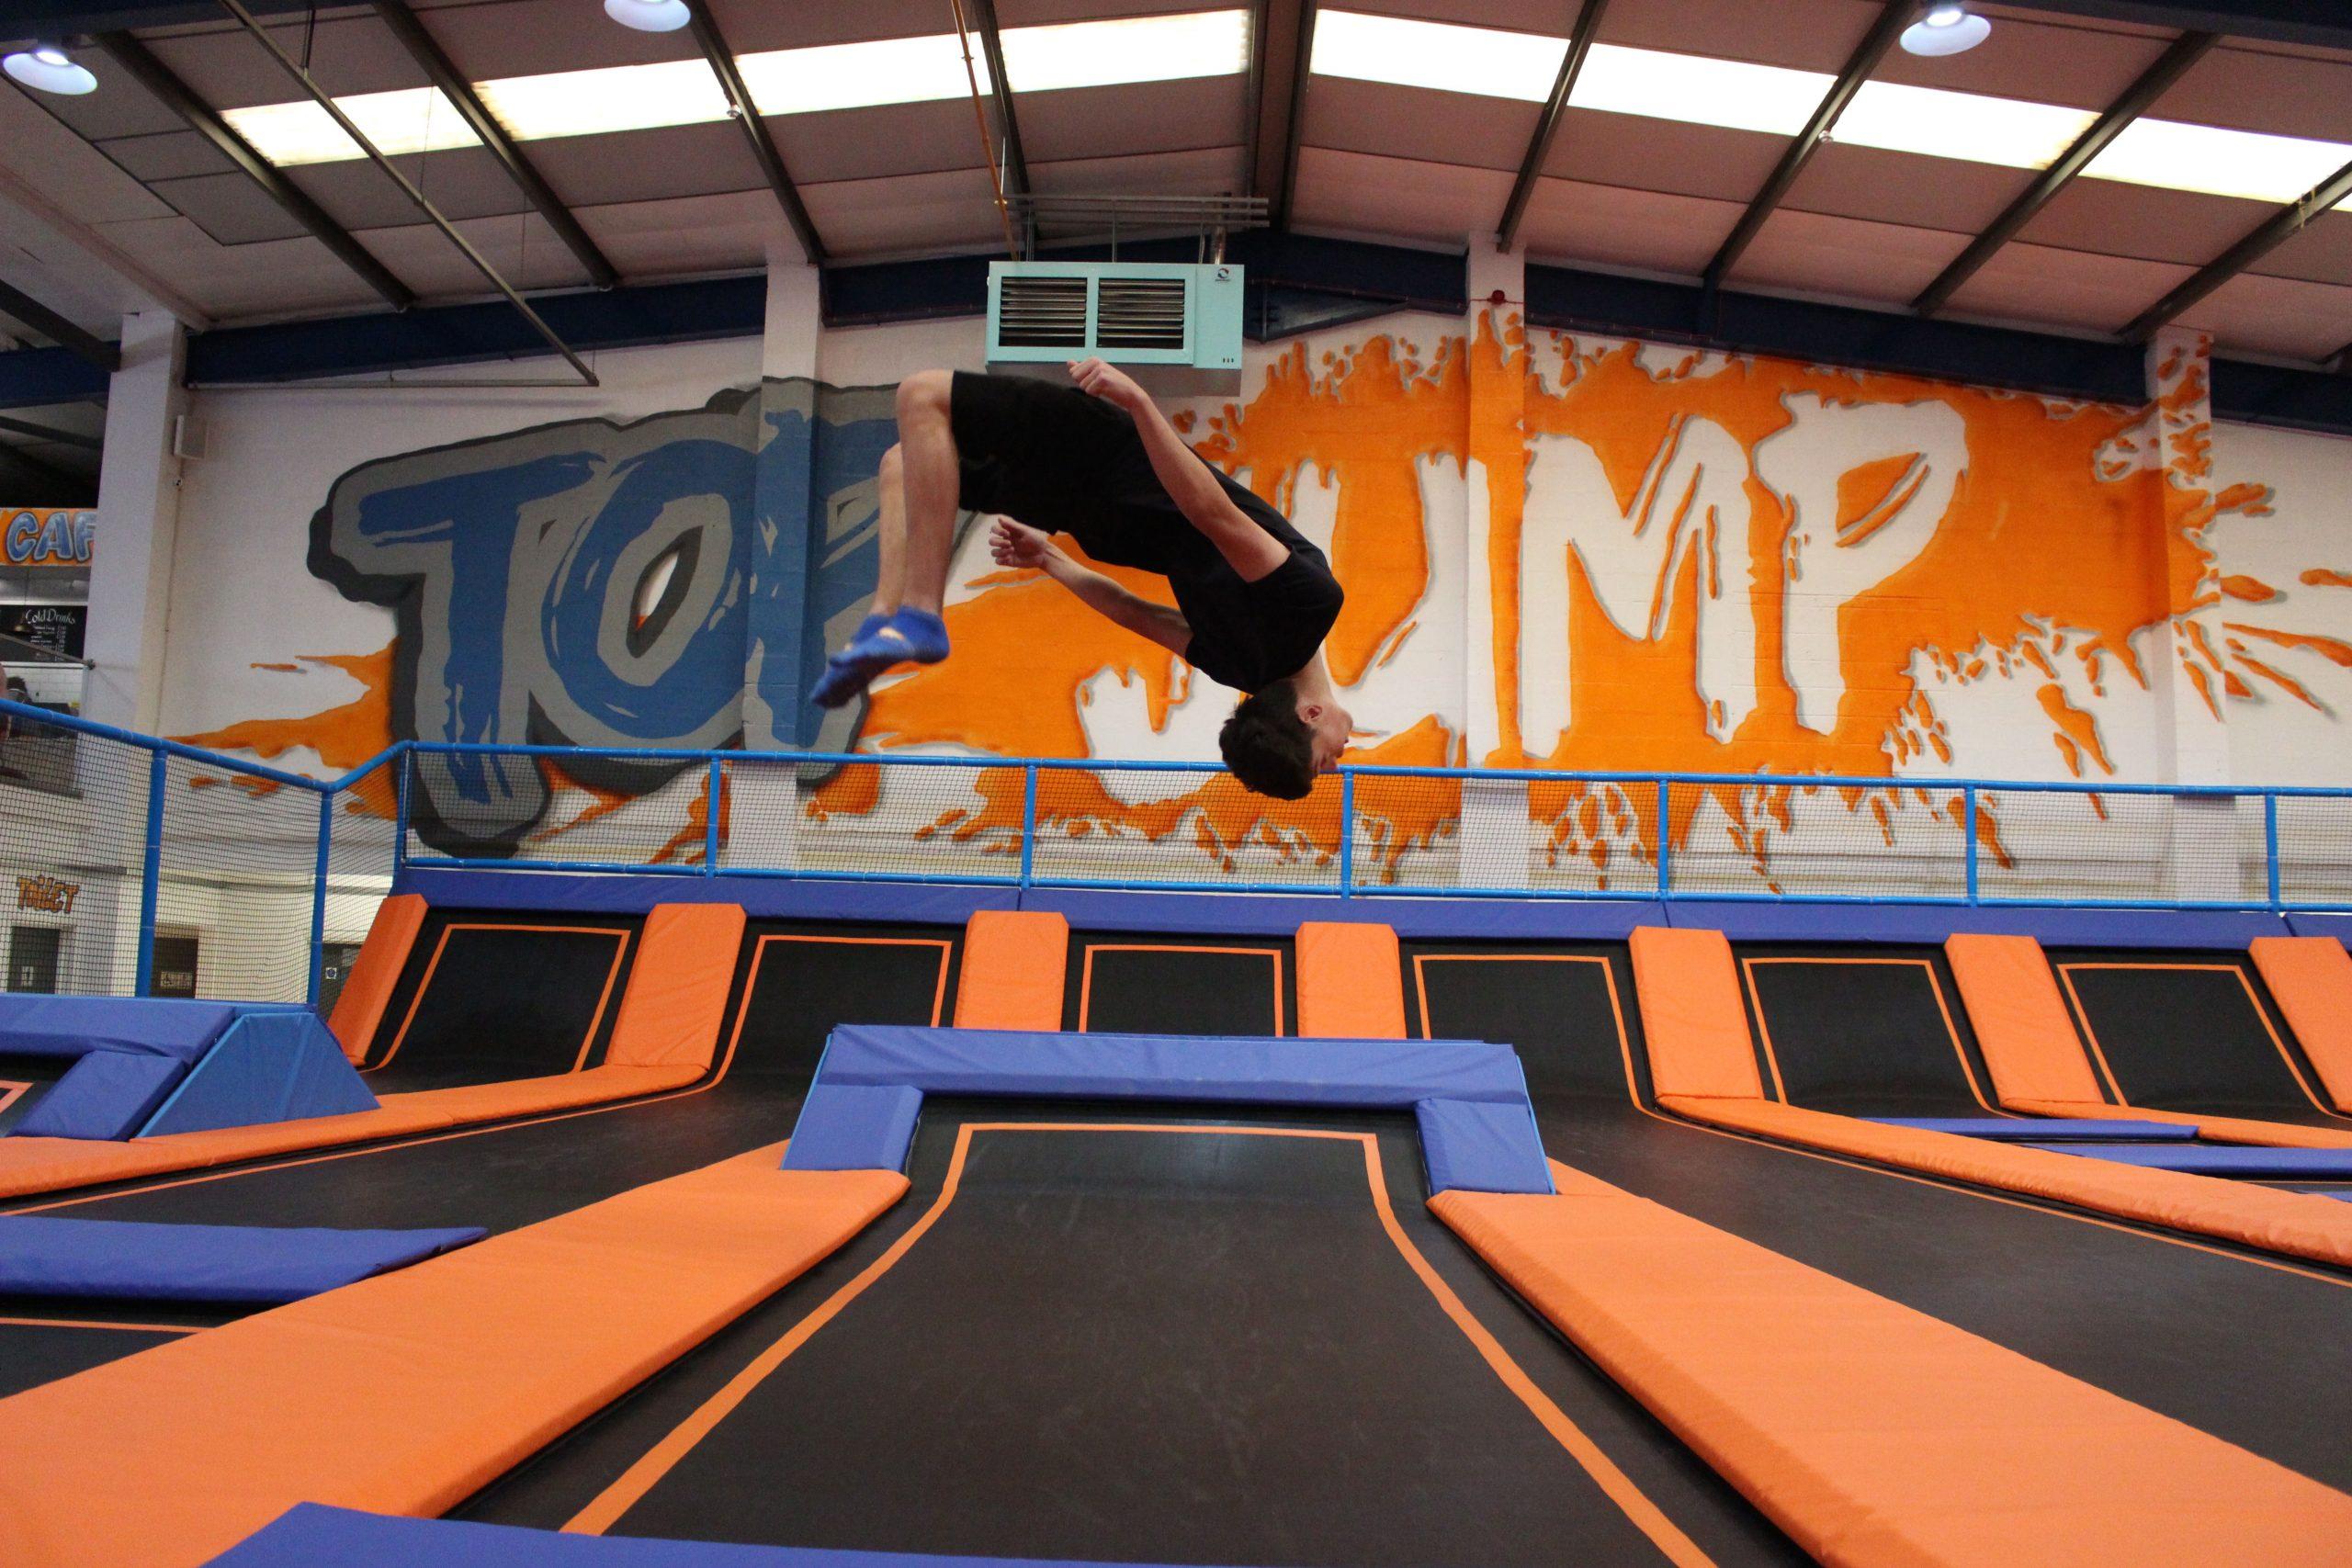 Take a bounce in Milton Keynes Image